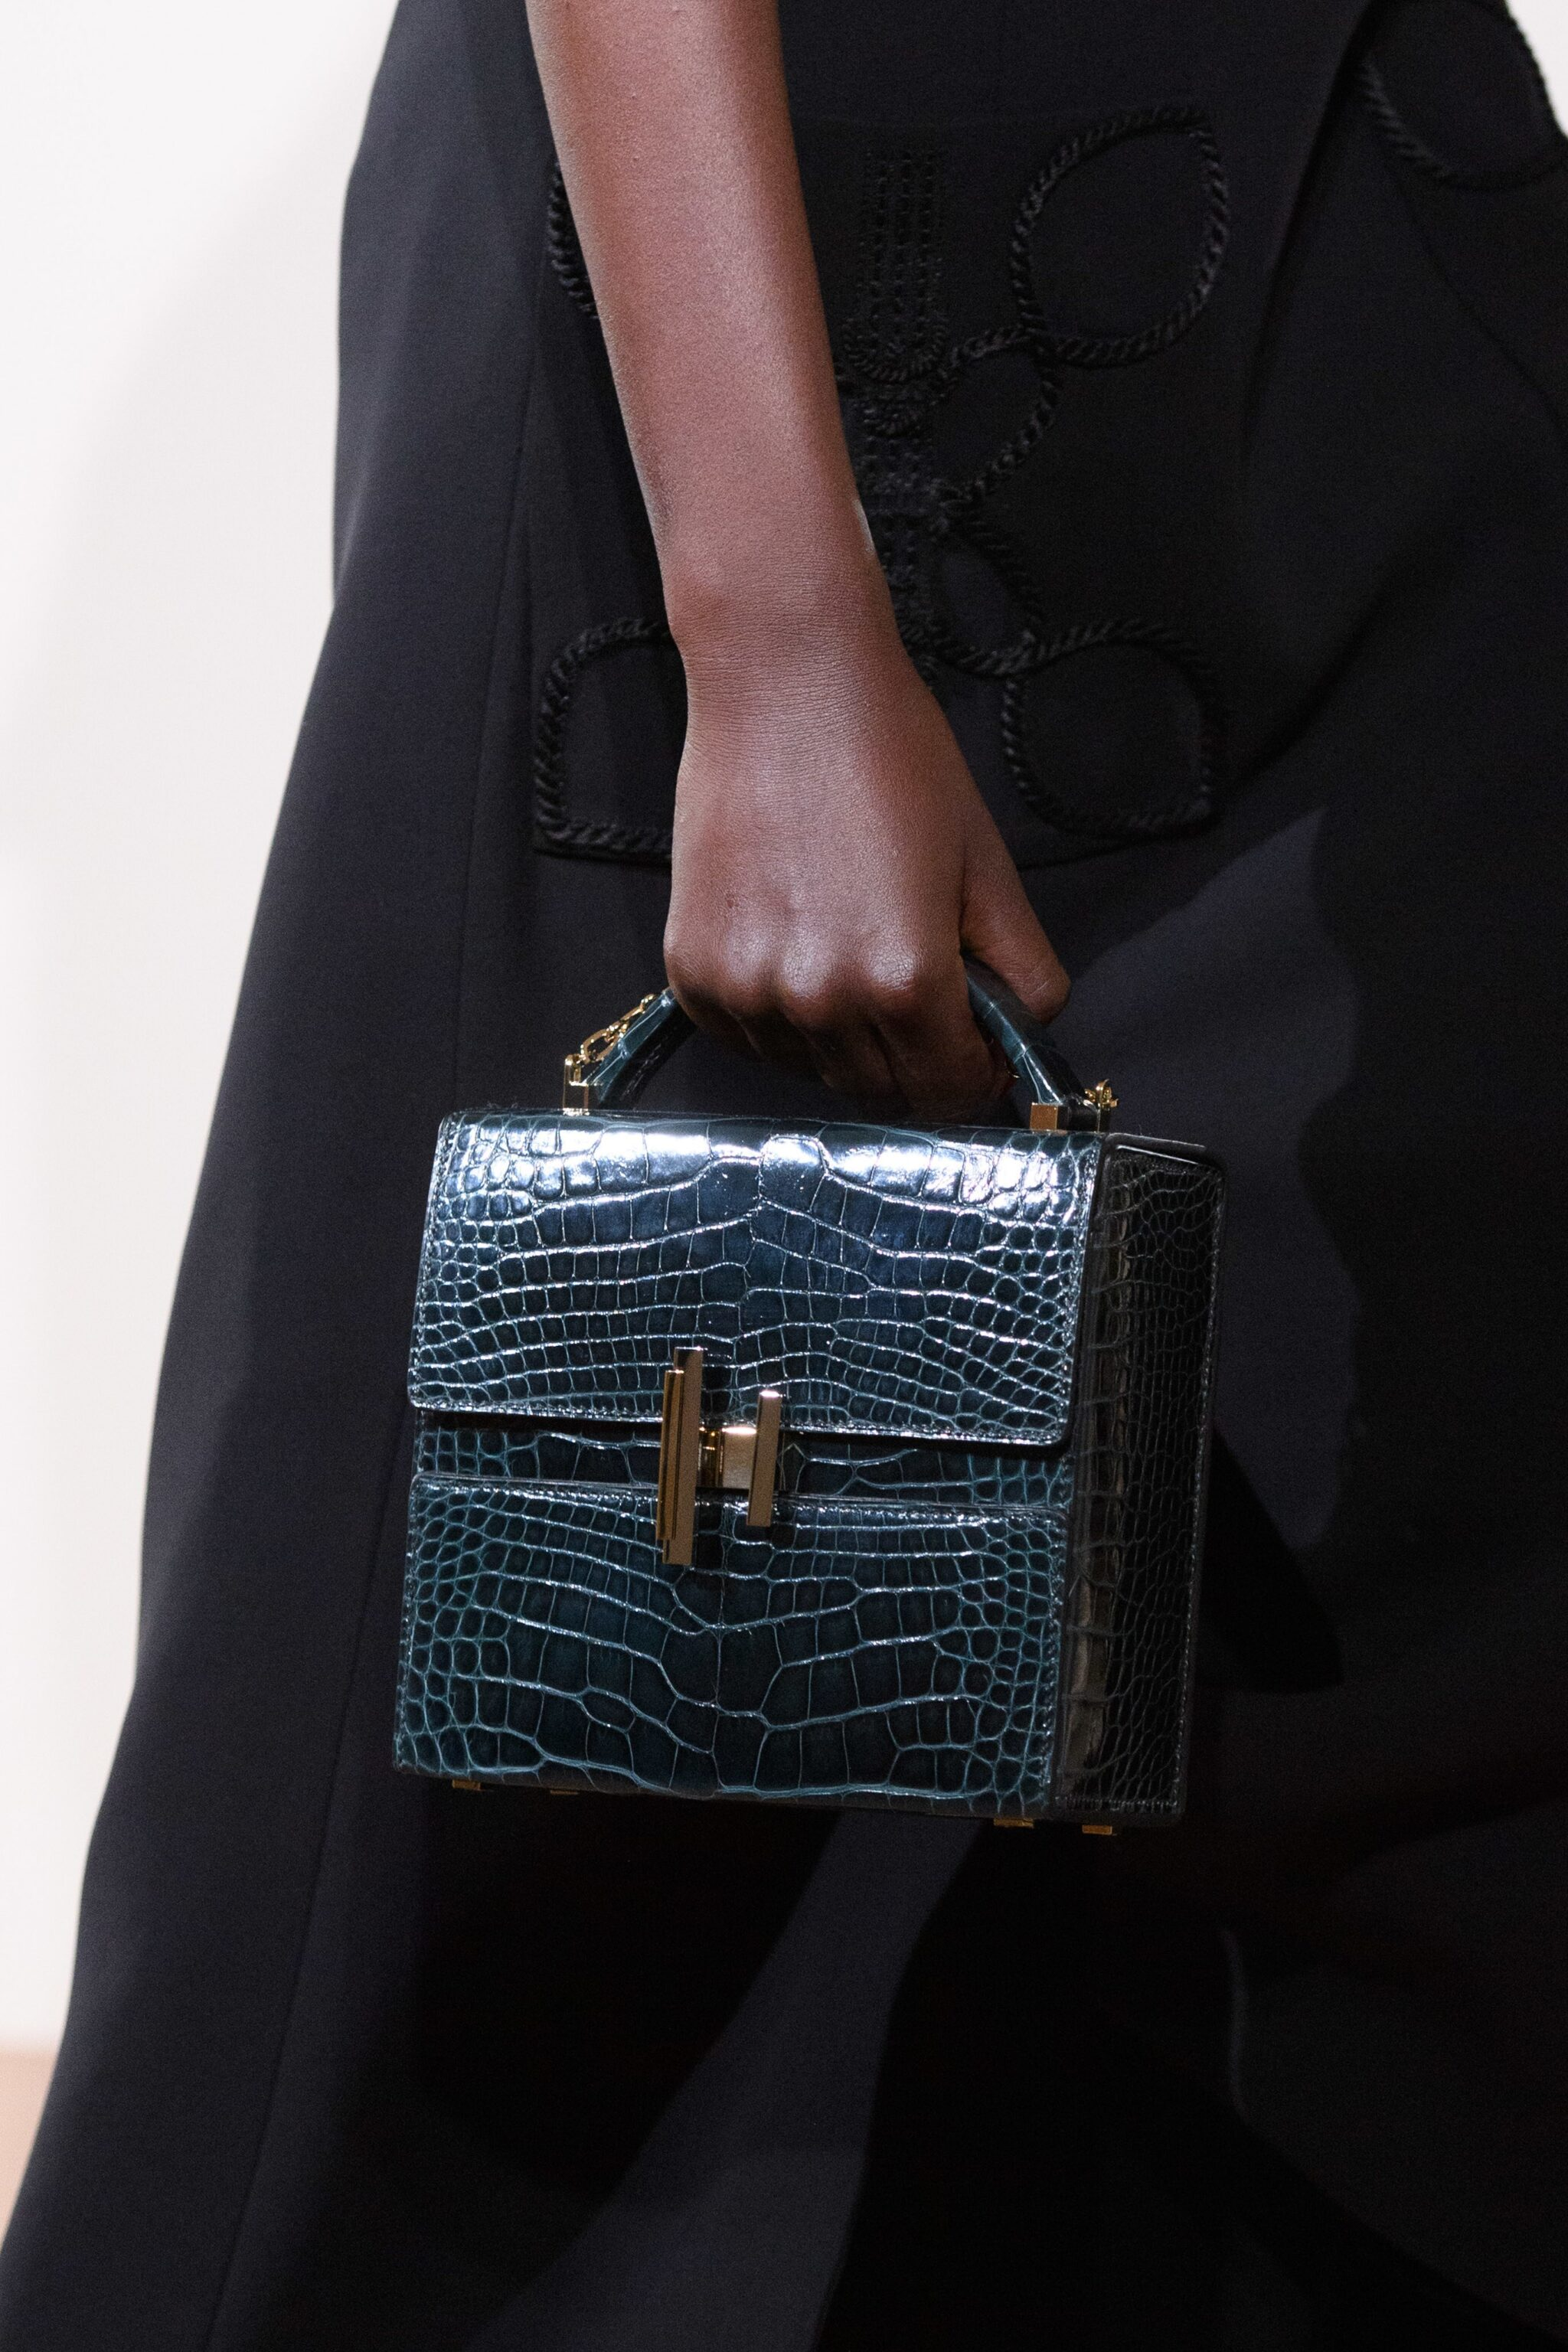 228cb35eb2e9 Hermes Black Crocodile Cinhetic Boxy Top Handle Bag - Pre-Fall 2019